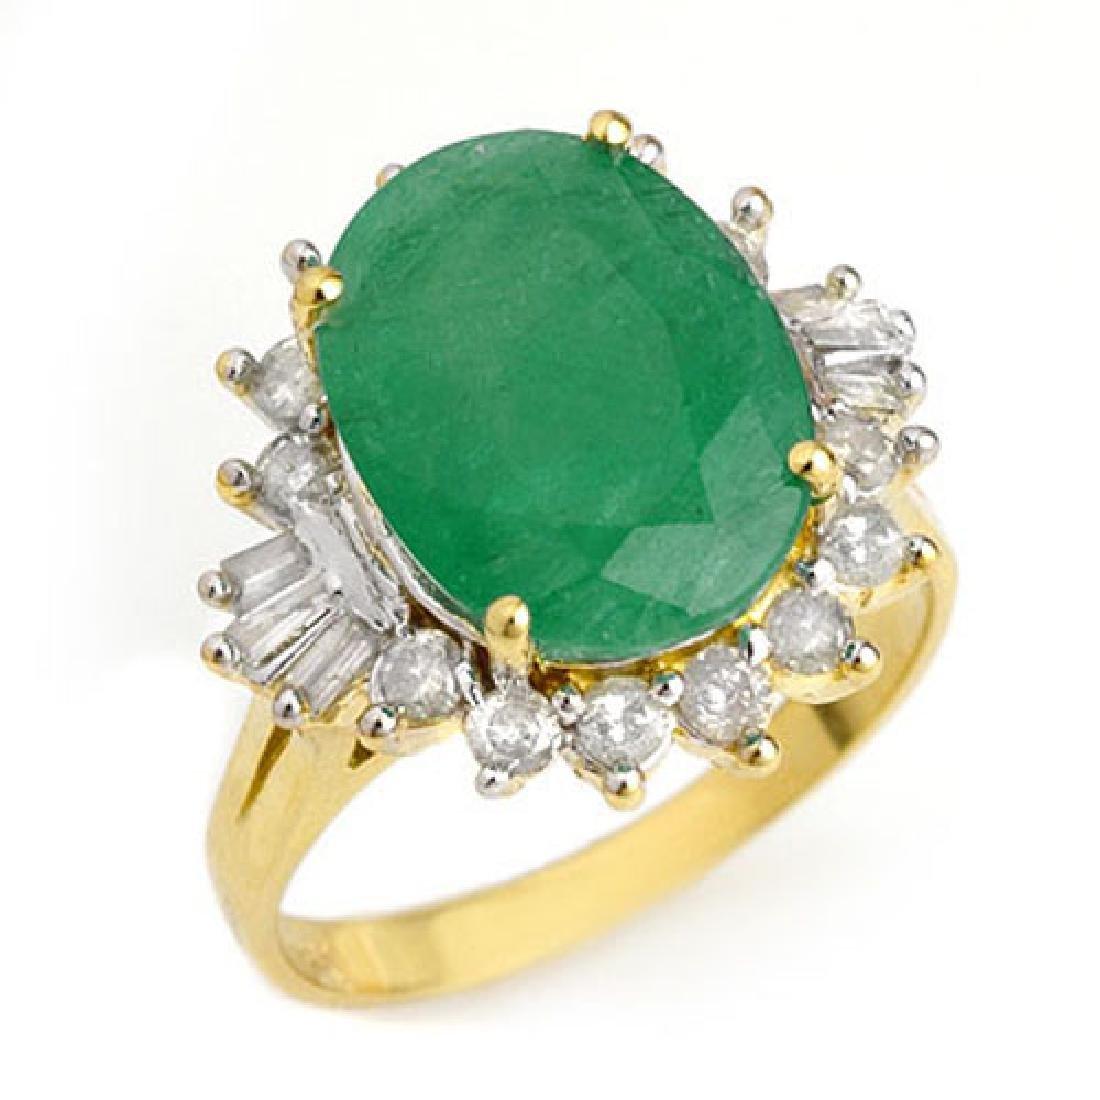 5.98 CTW Emerald & Diamond Ring 14K Yellow Gold